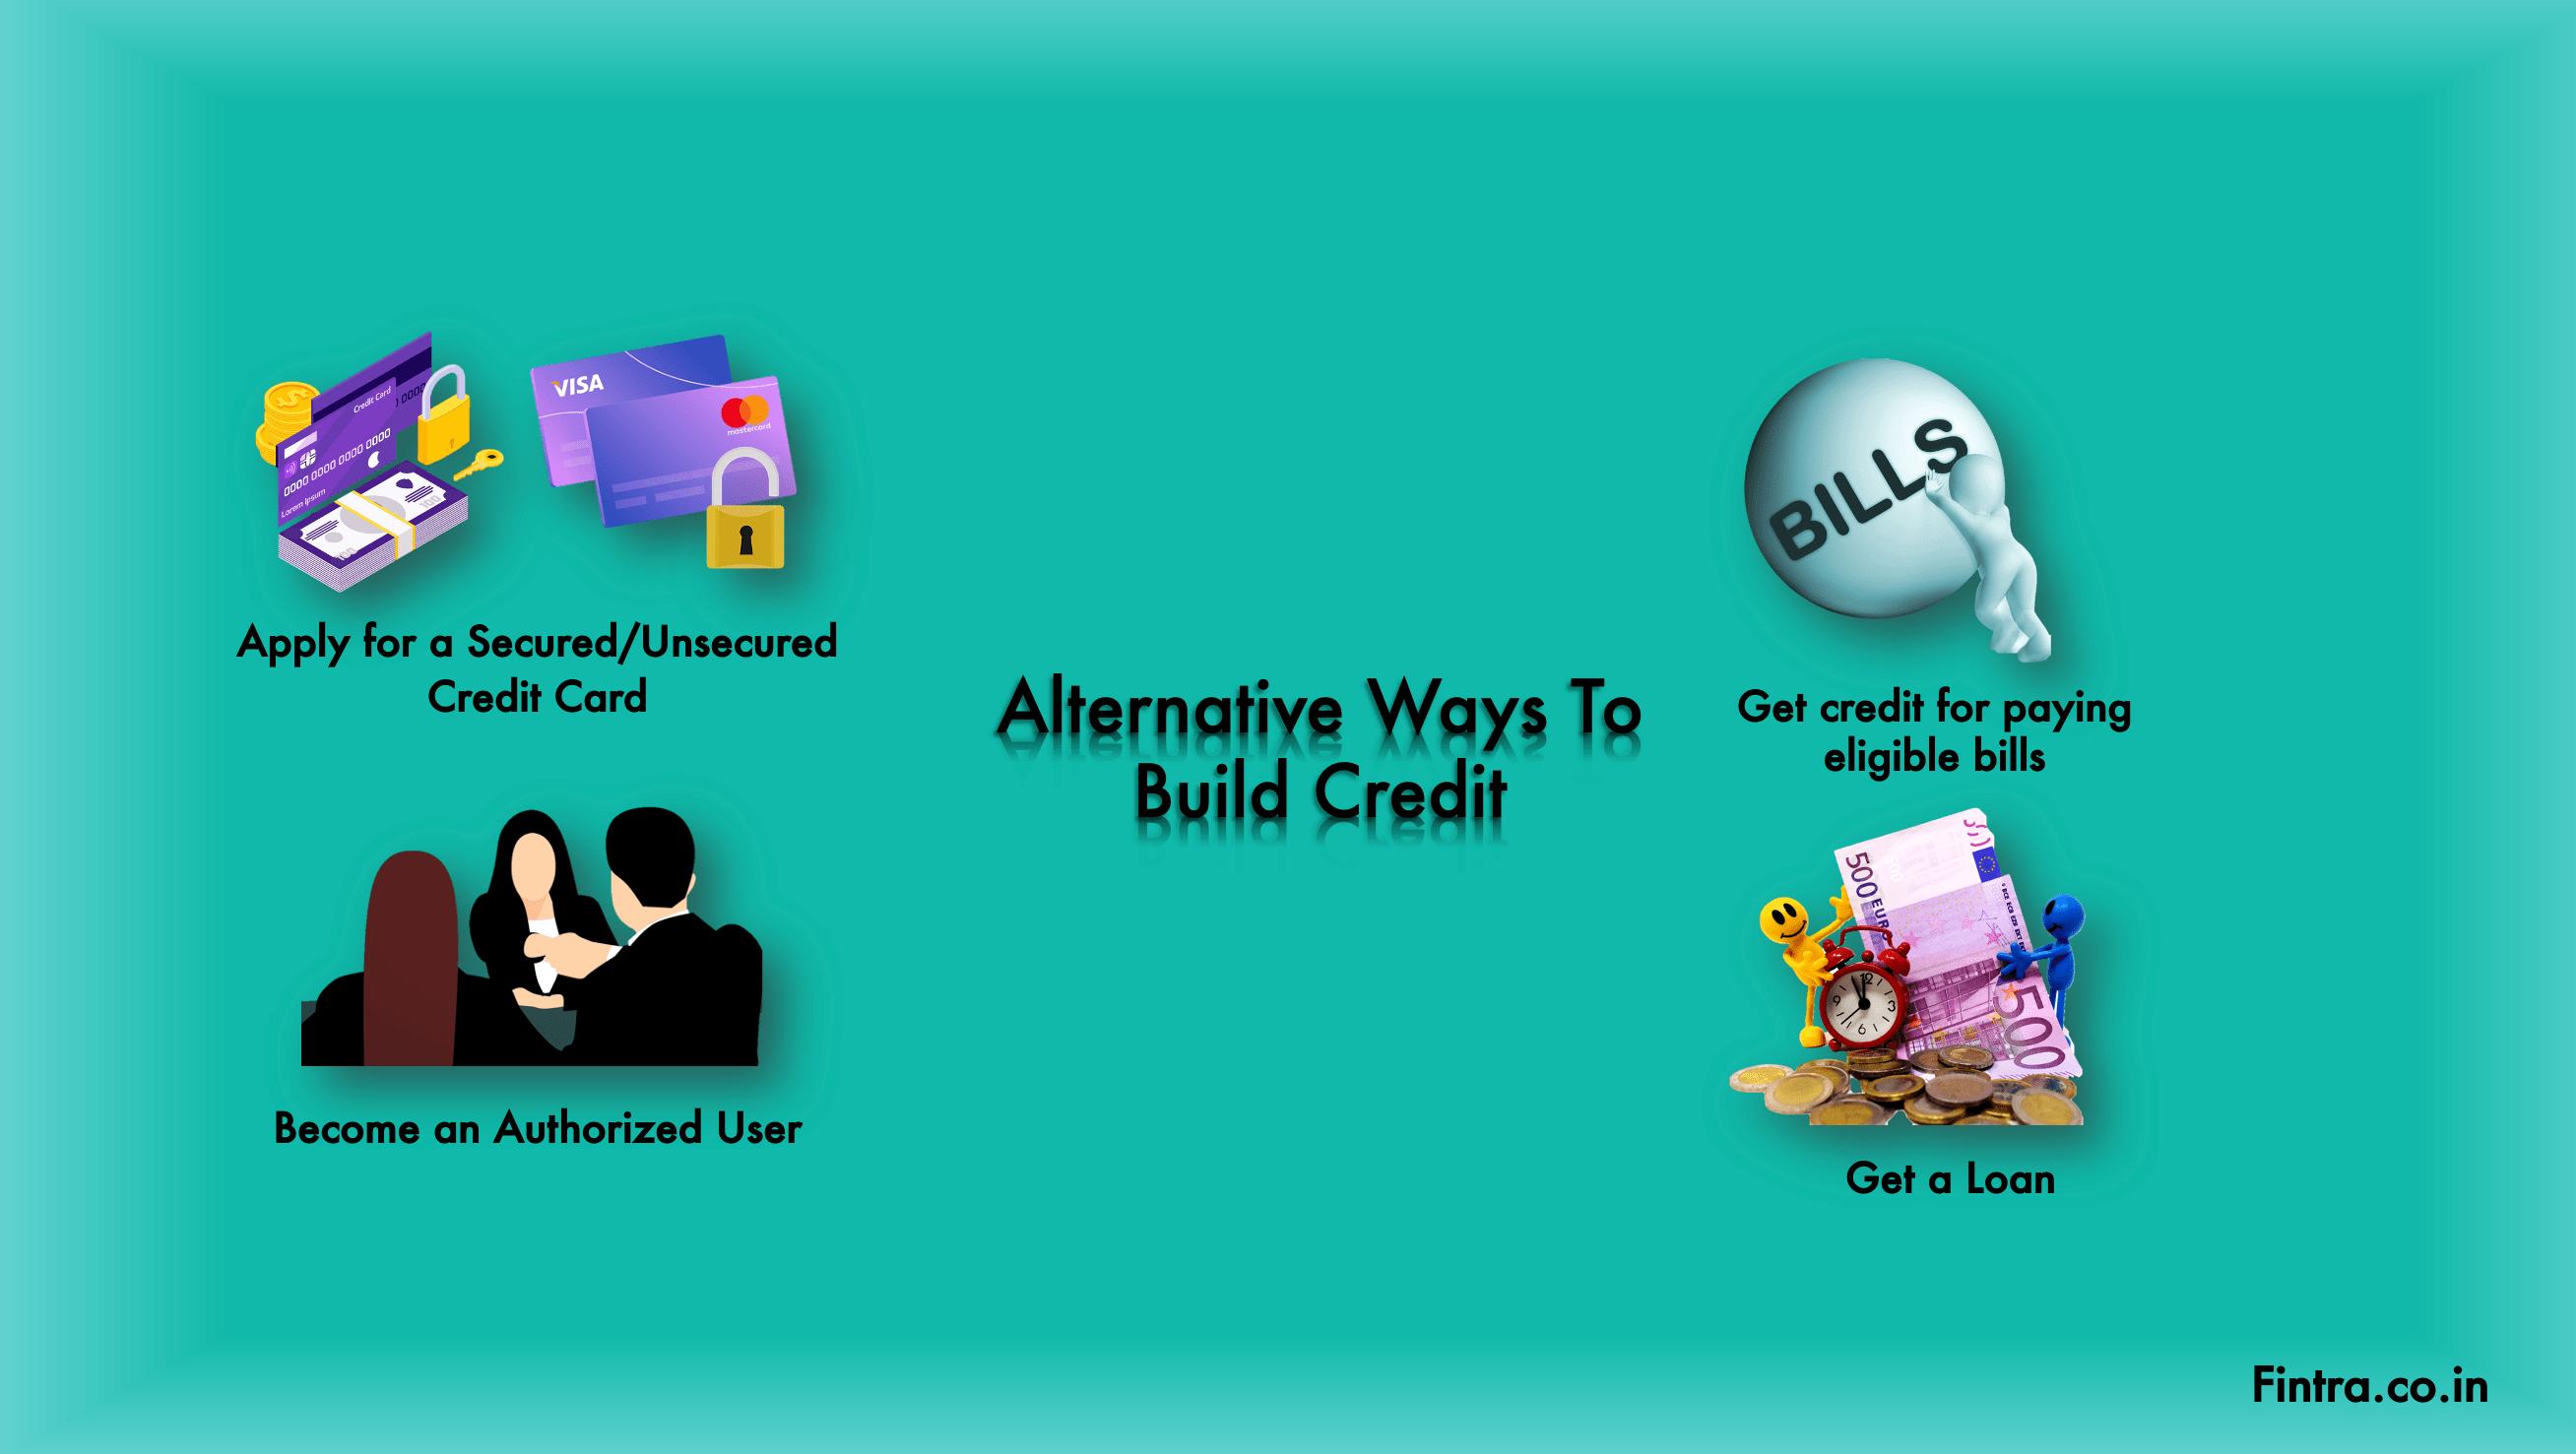 Alternative Ways To Build Credit